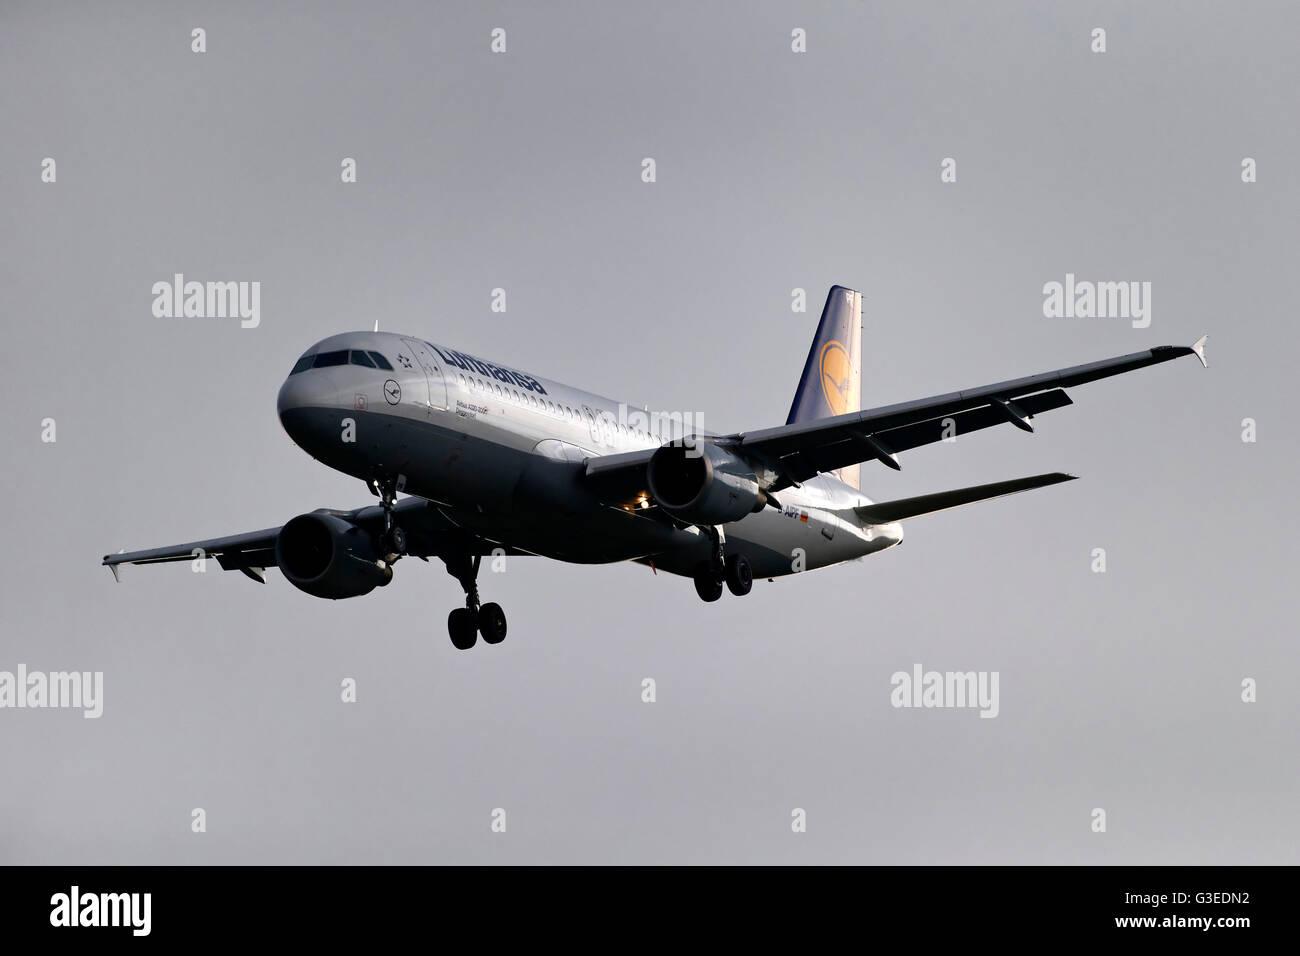 Lufthansa Airbus A320-200 passenger aircraft, on landing approach to  Franz Josef Strauss Airport, Munich, Germany - Stock Image